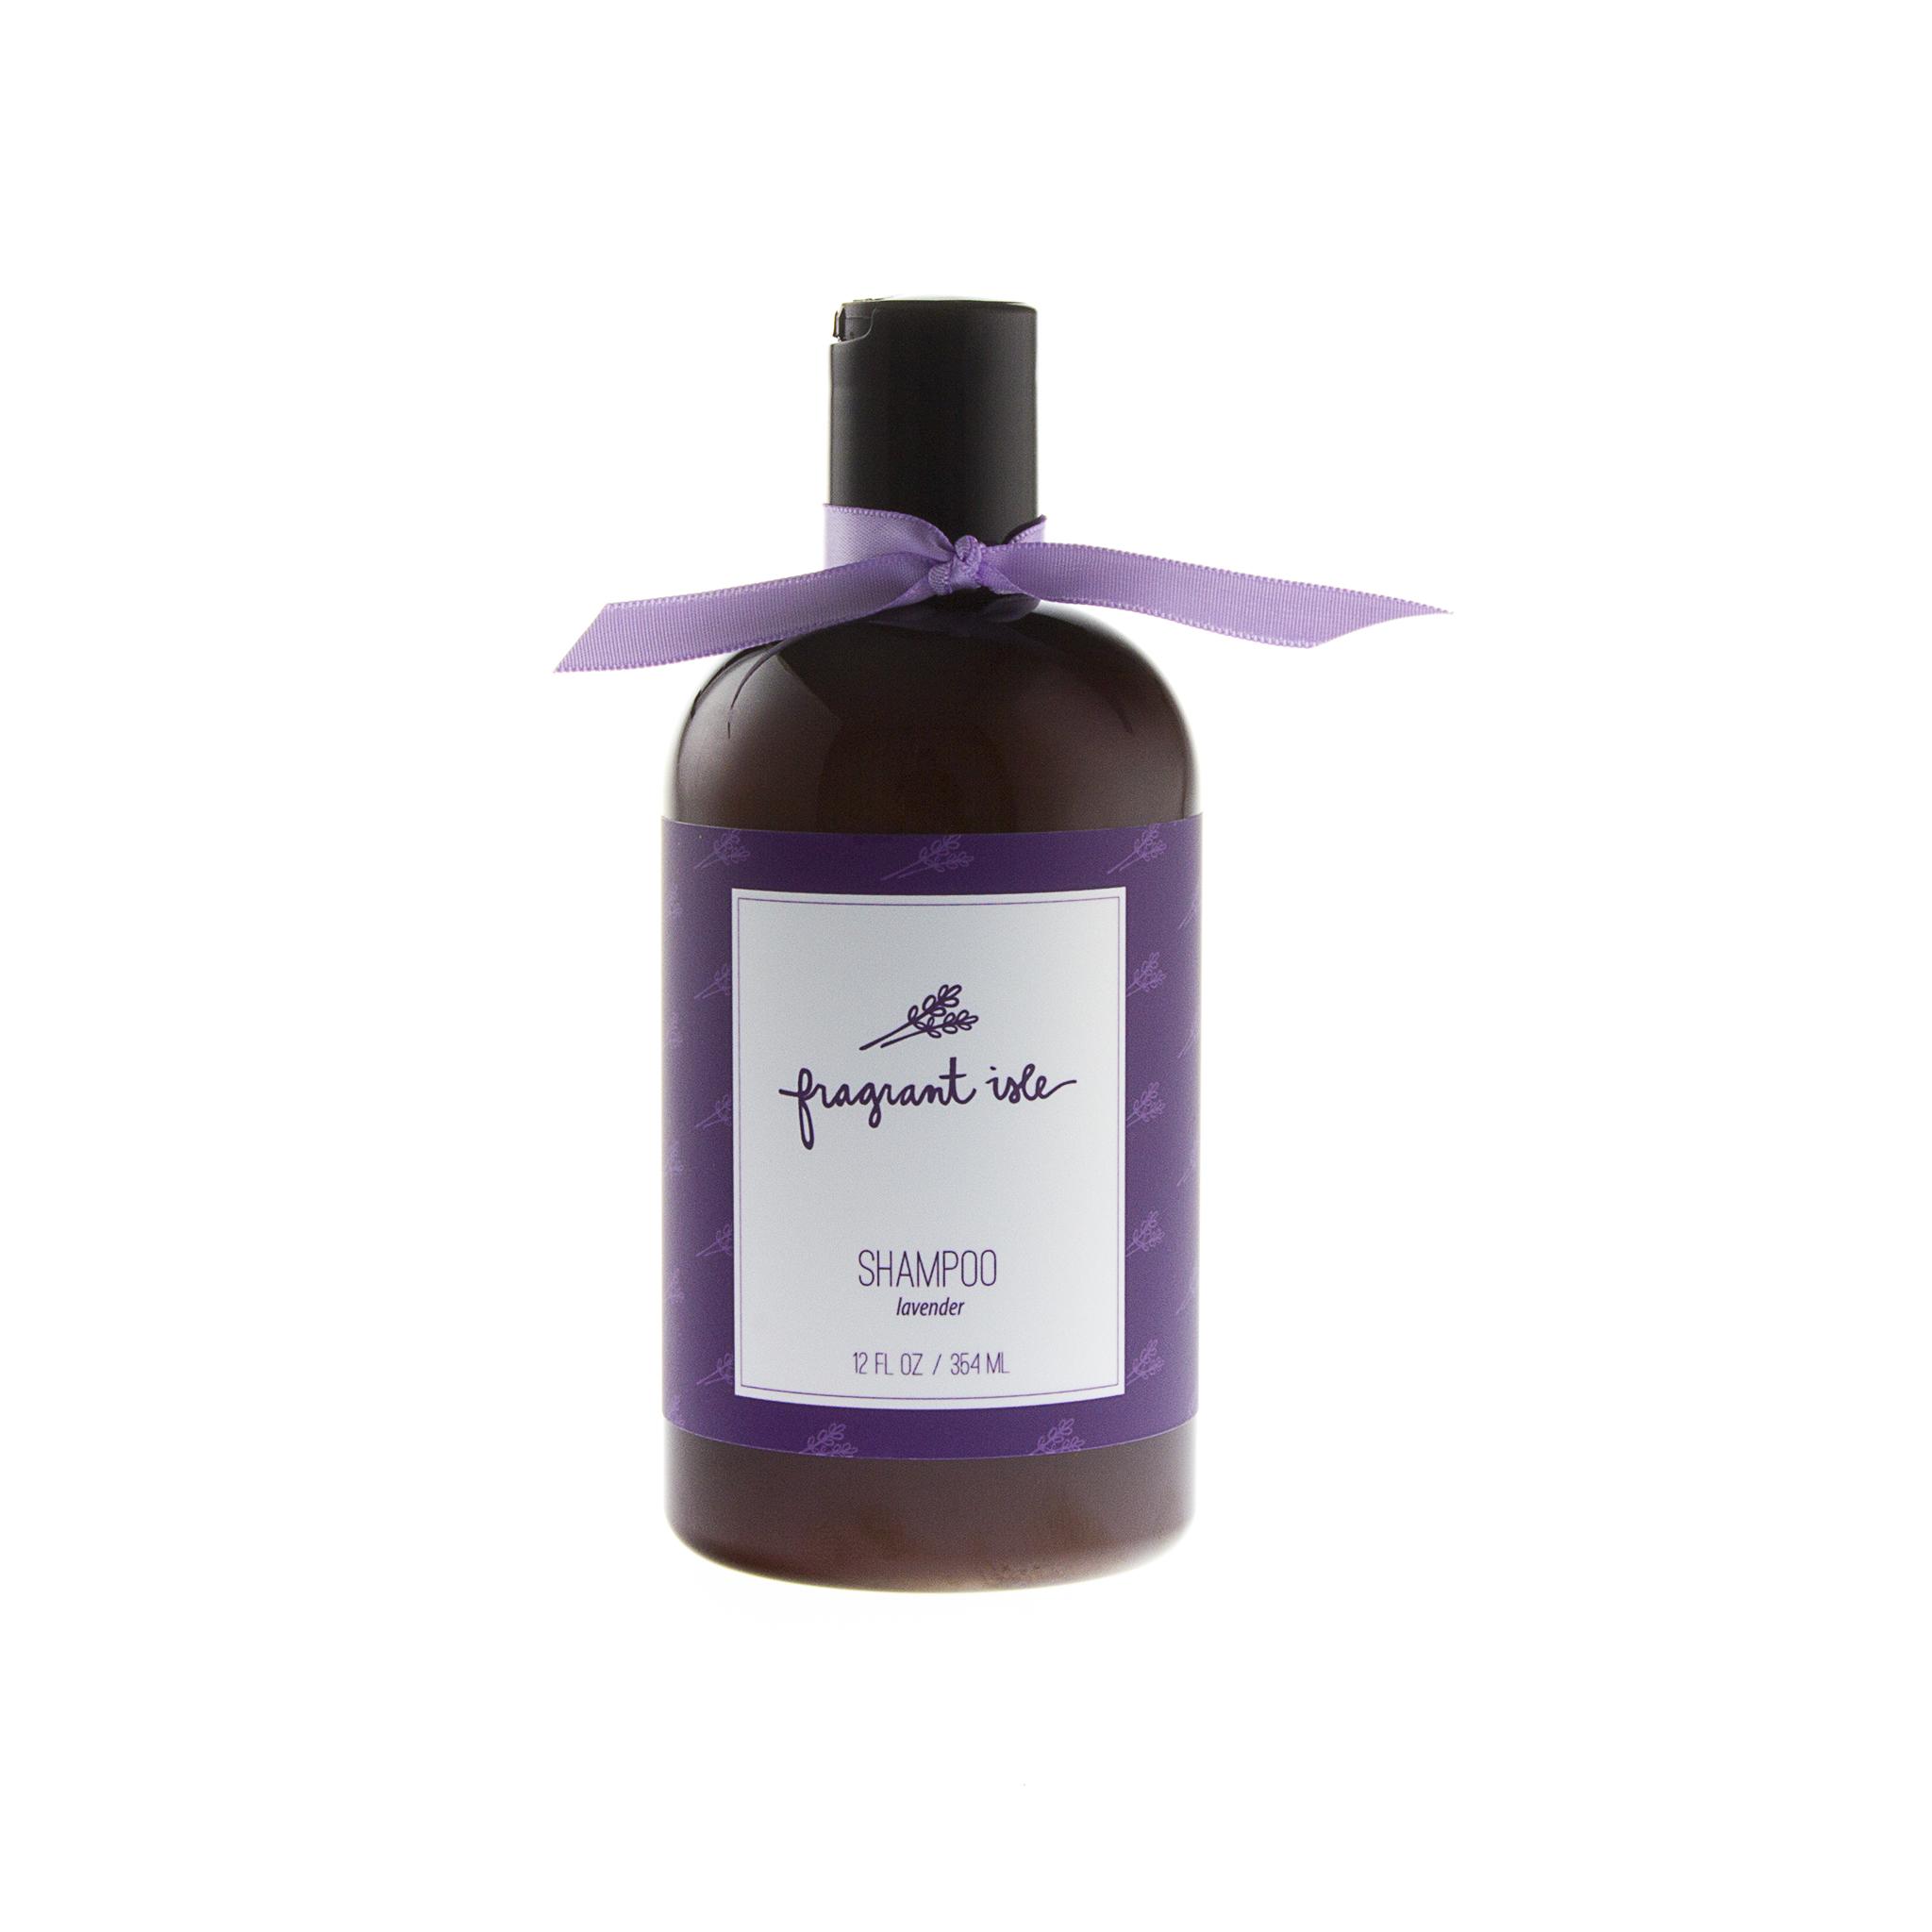 fragrant_isle_lavender_shampoo_packaging.jpg